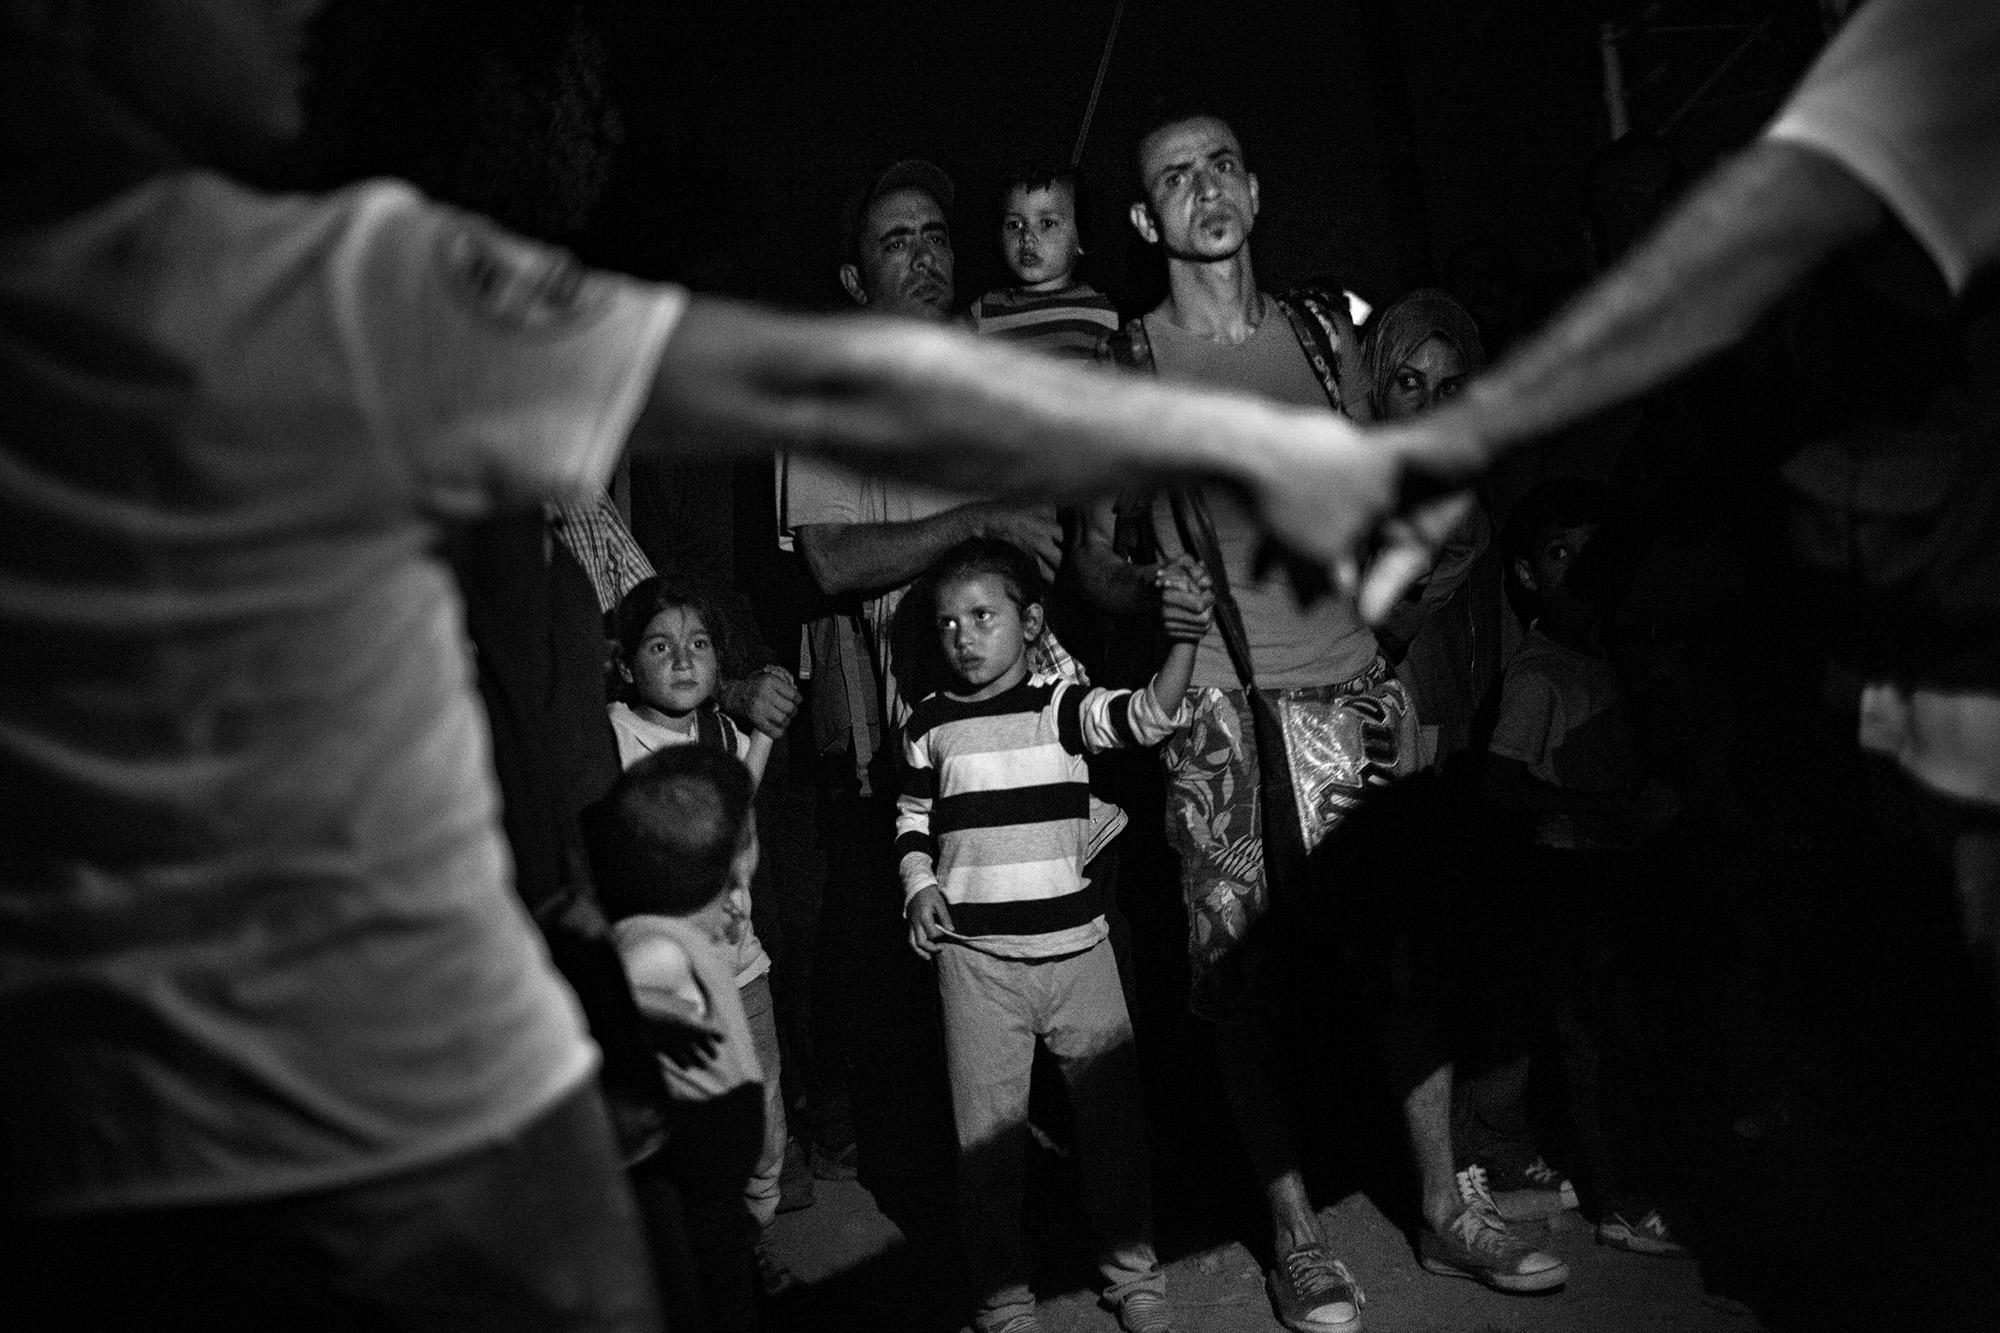 Idomeni, Greece - Syrian refugees waiting to cross an illegal border between Greece and Macedonia near Idomeni, Greece.